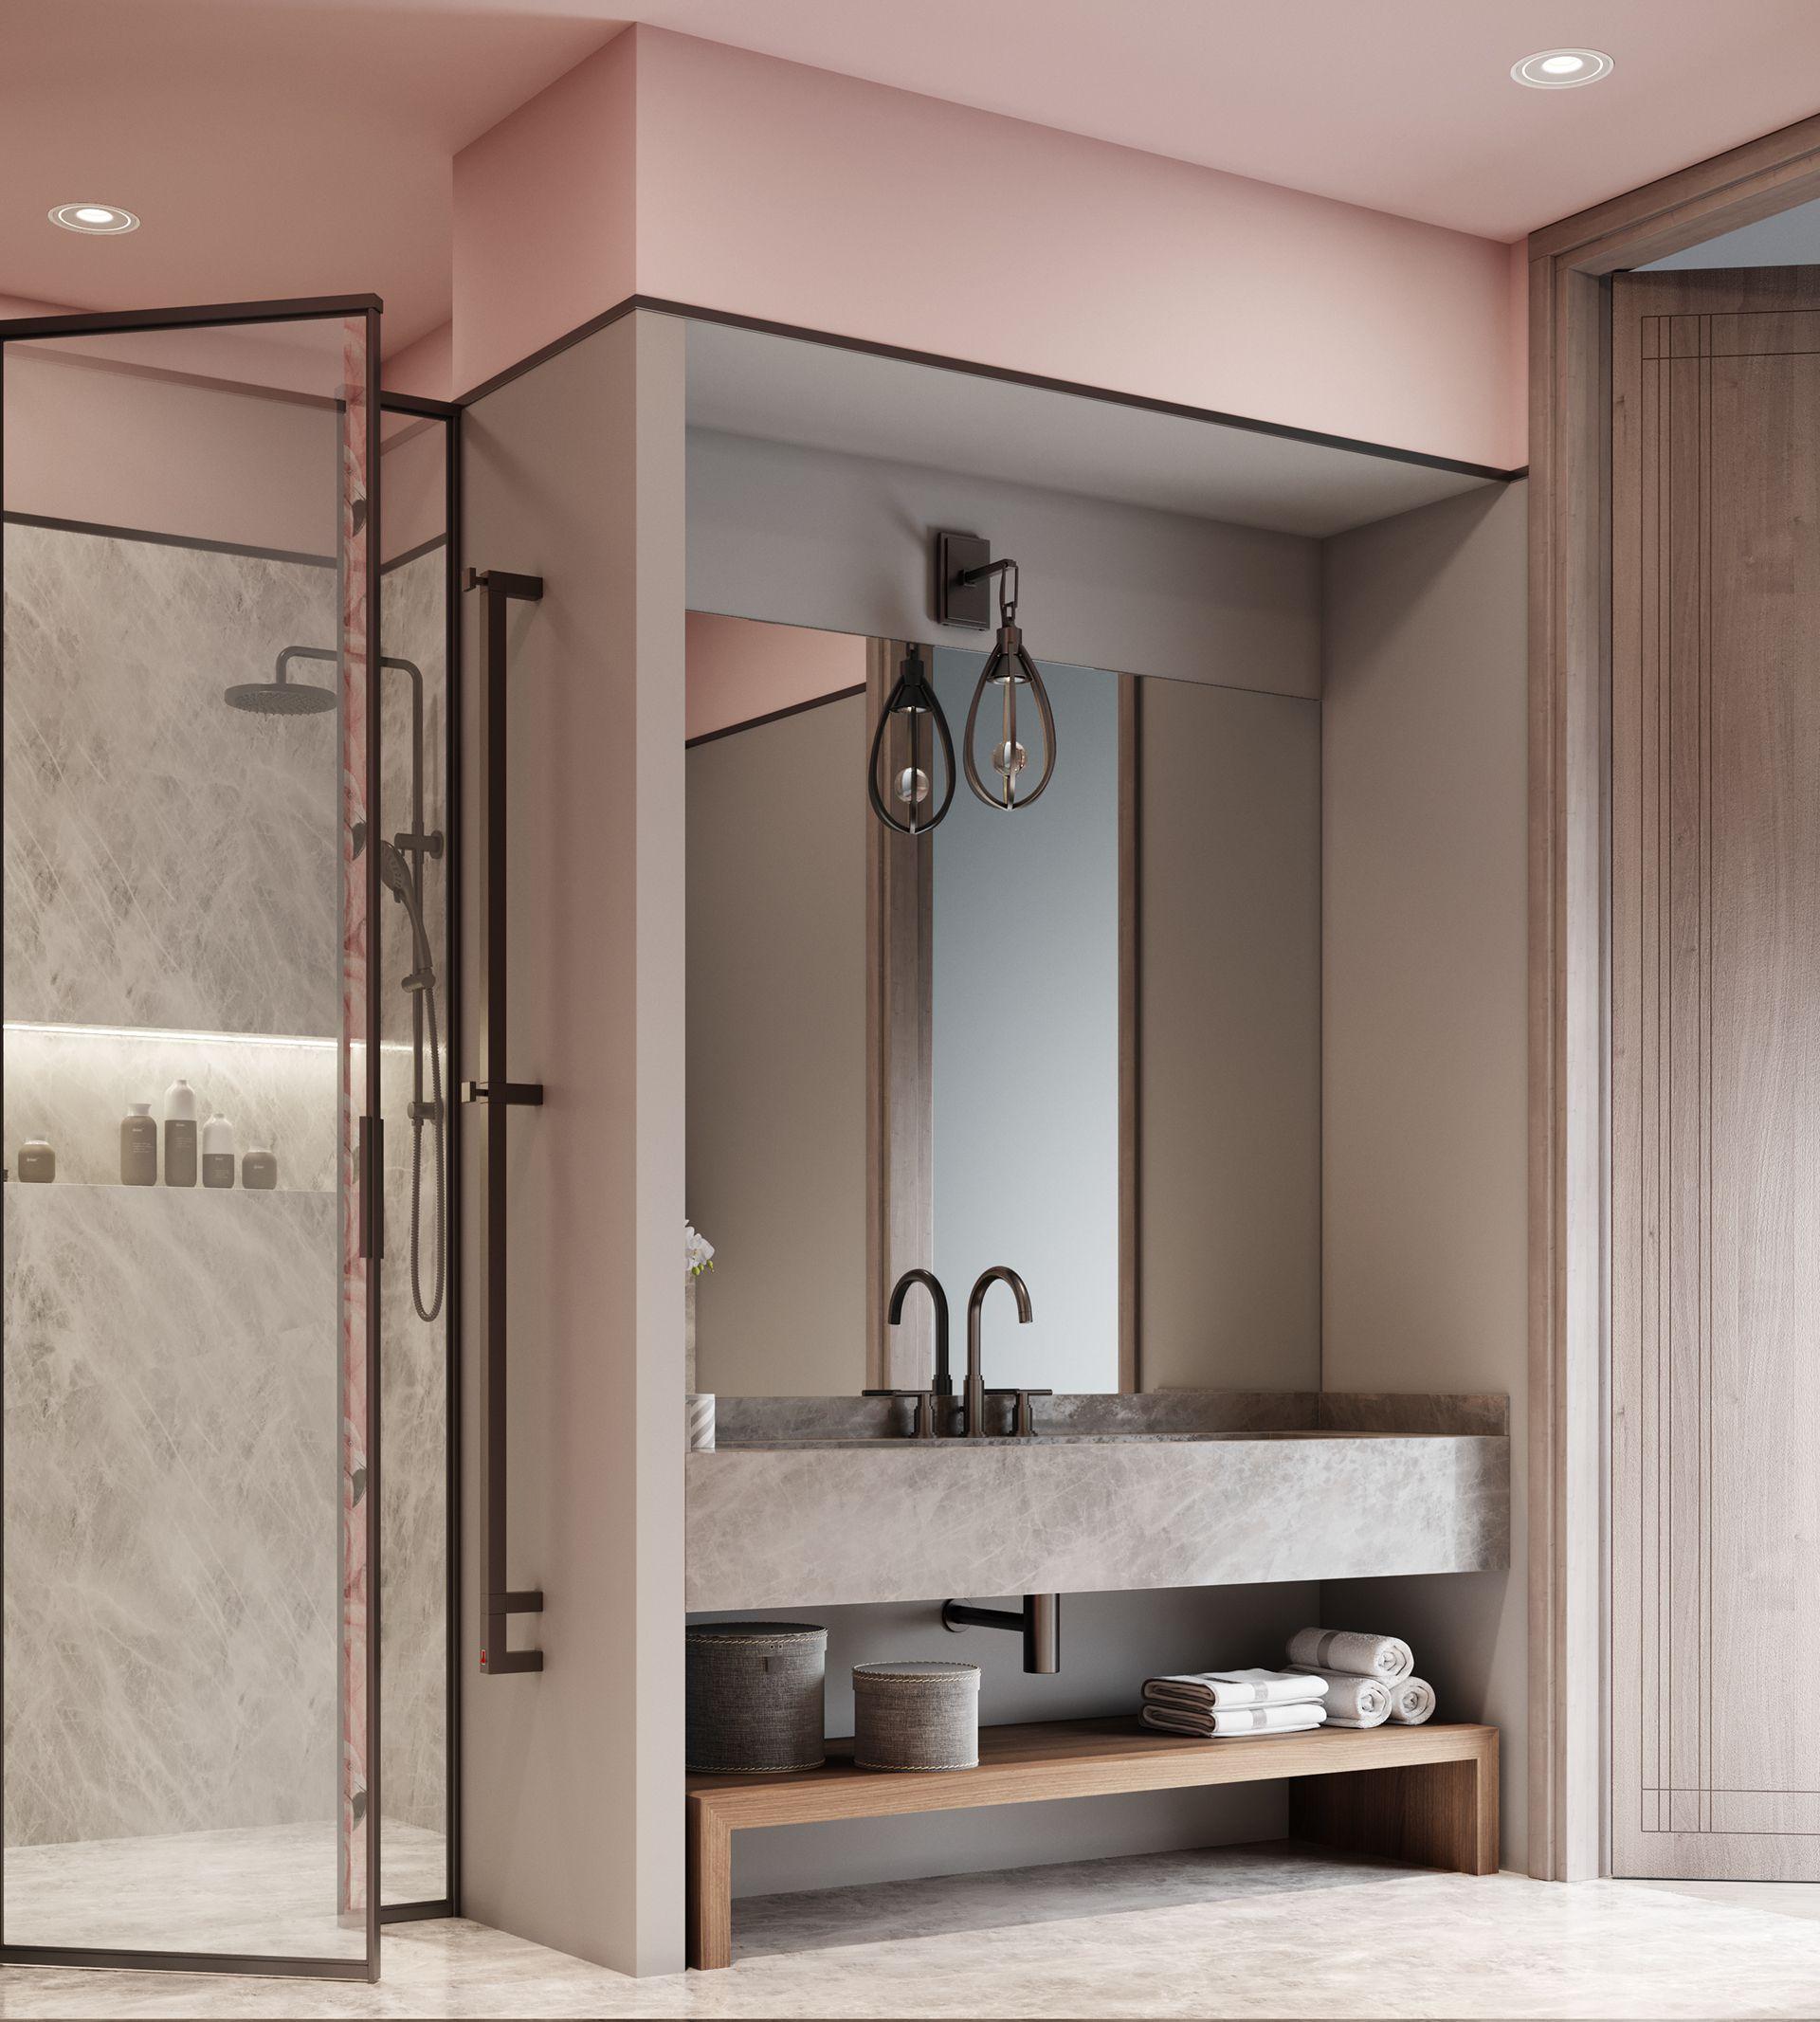 Https Www Behance Net Gallery 56069087 Apartment Project